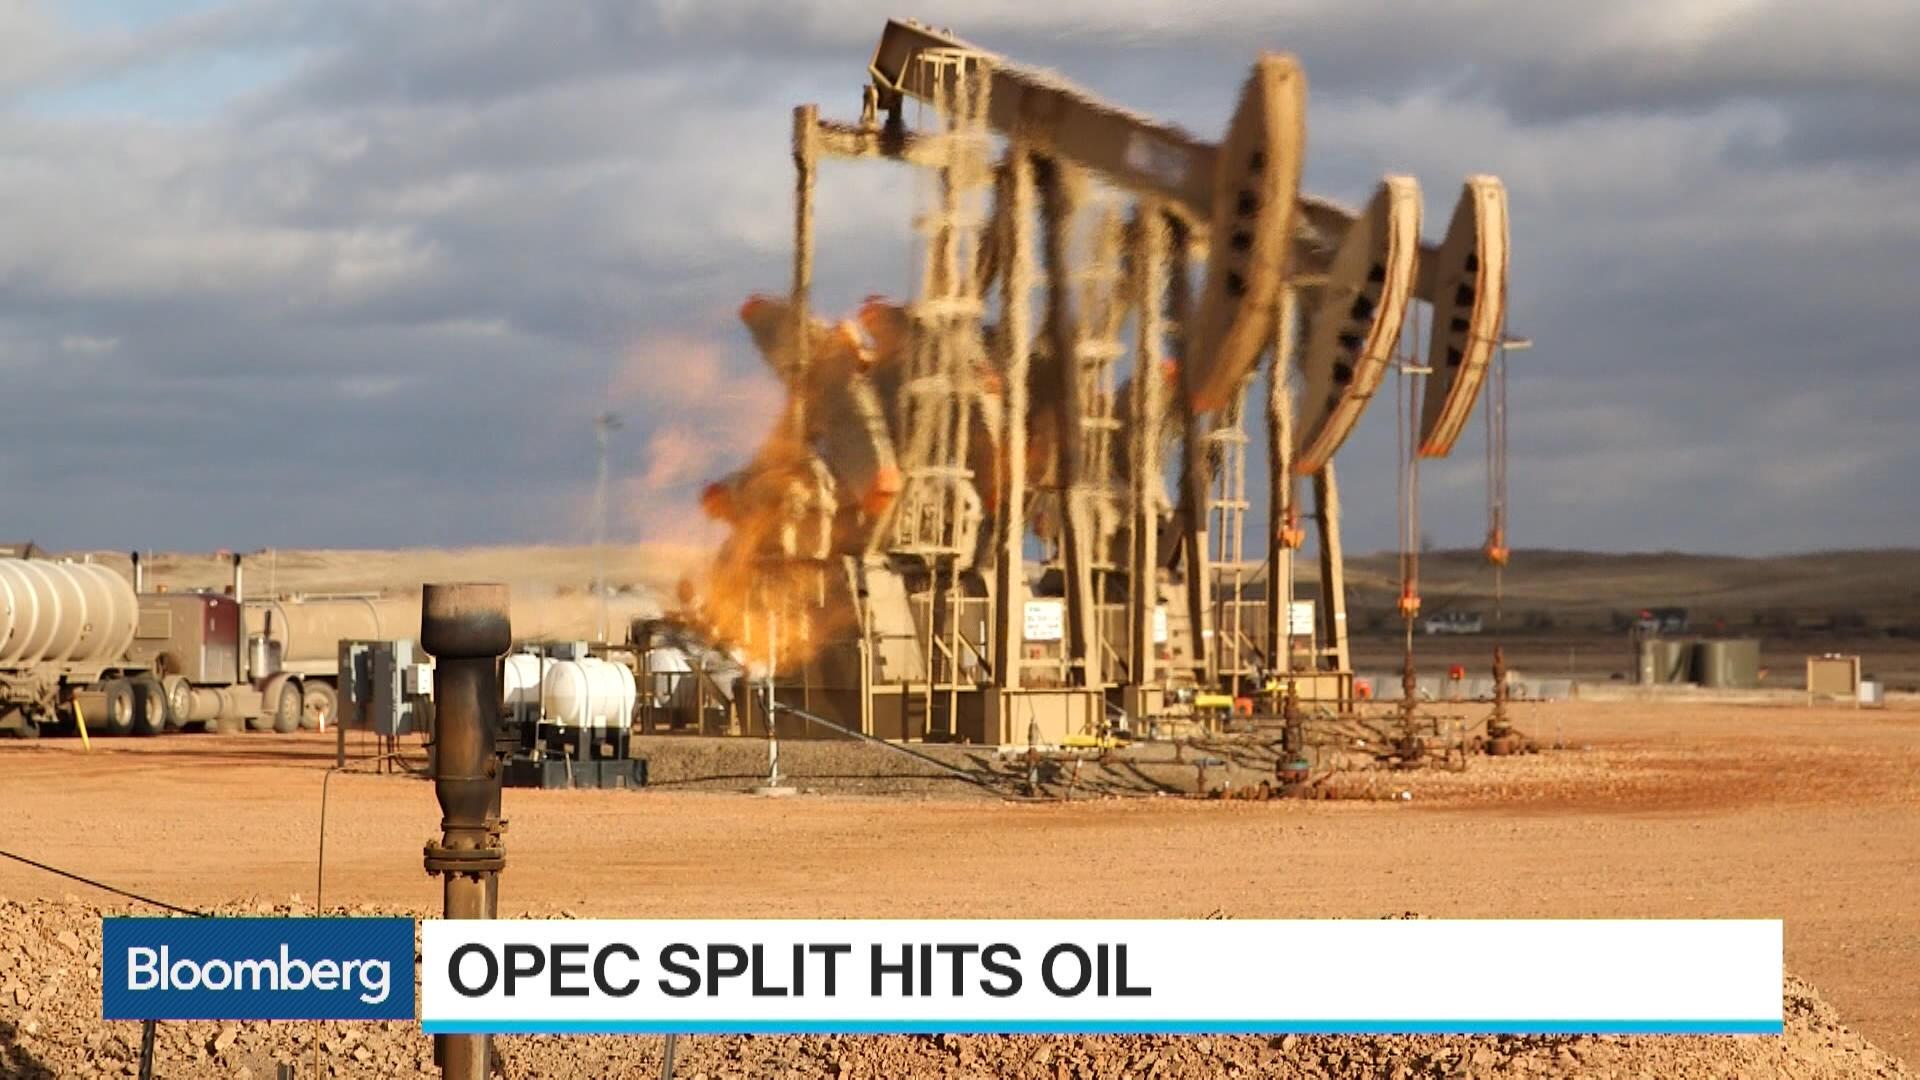 opecs oil supply fell - HD1920×1080